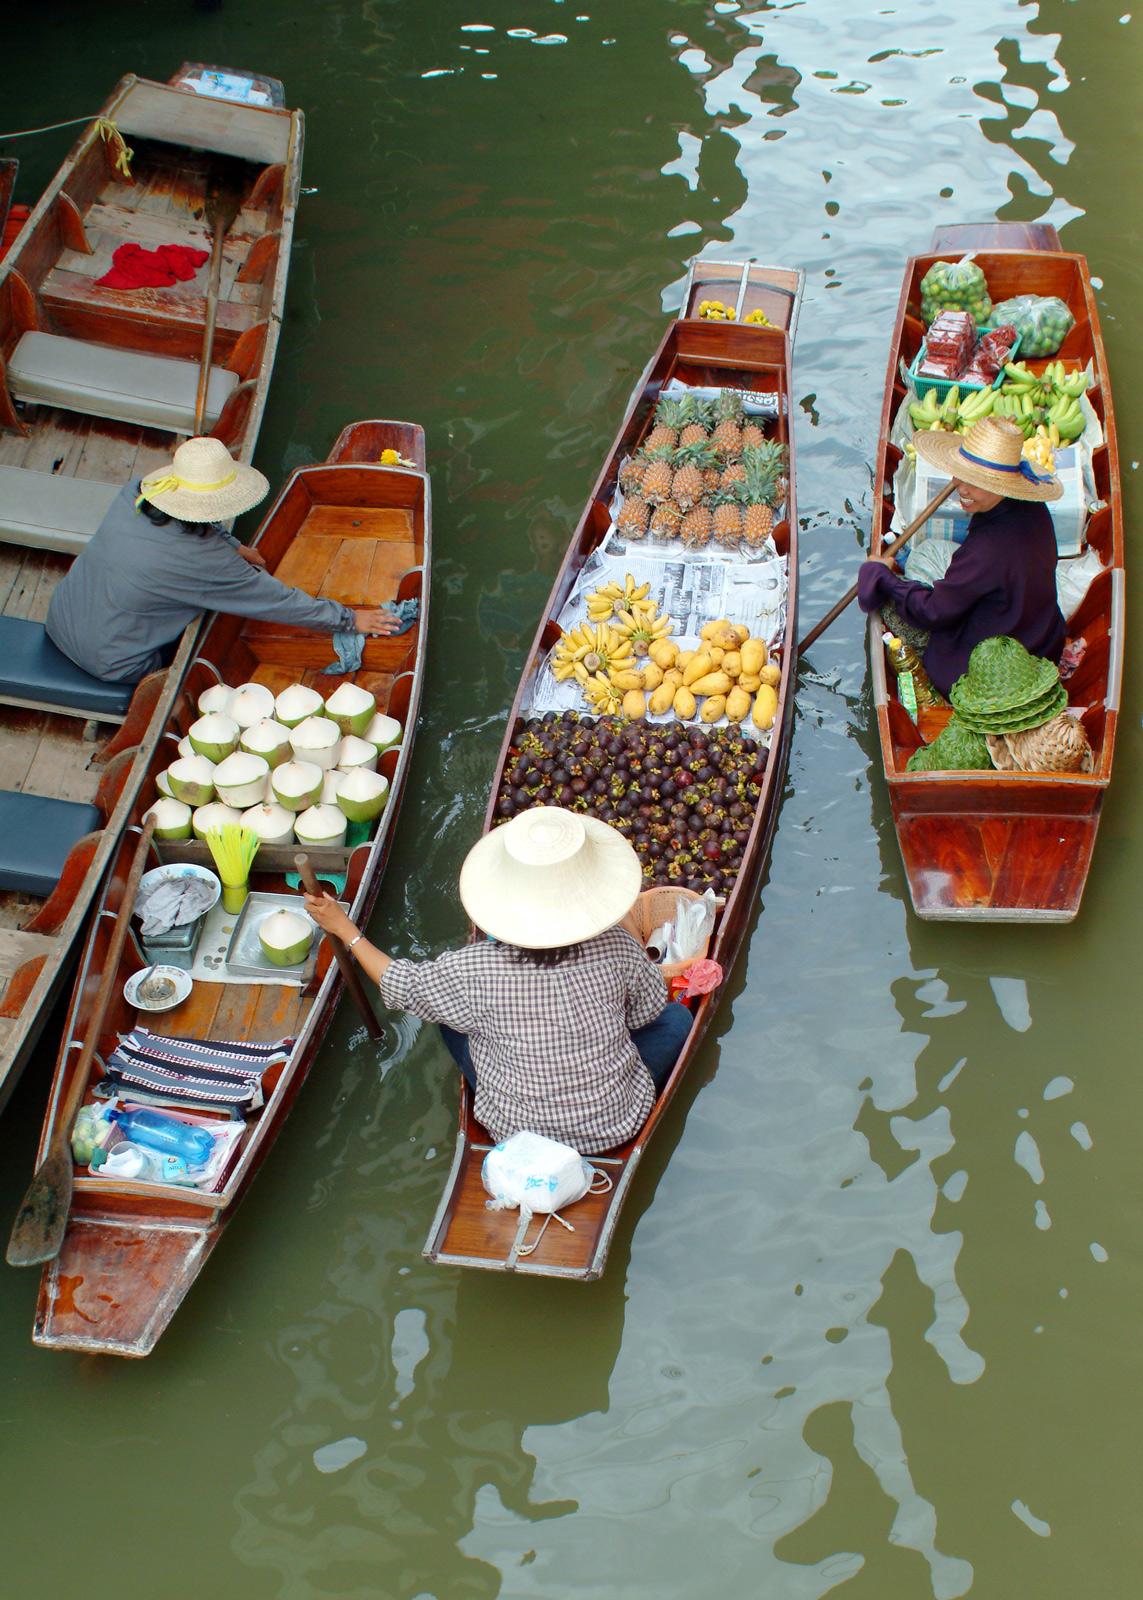 Mercado flotante de Bangkok. Imagen de Turismo de Tailandia